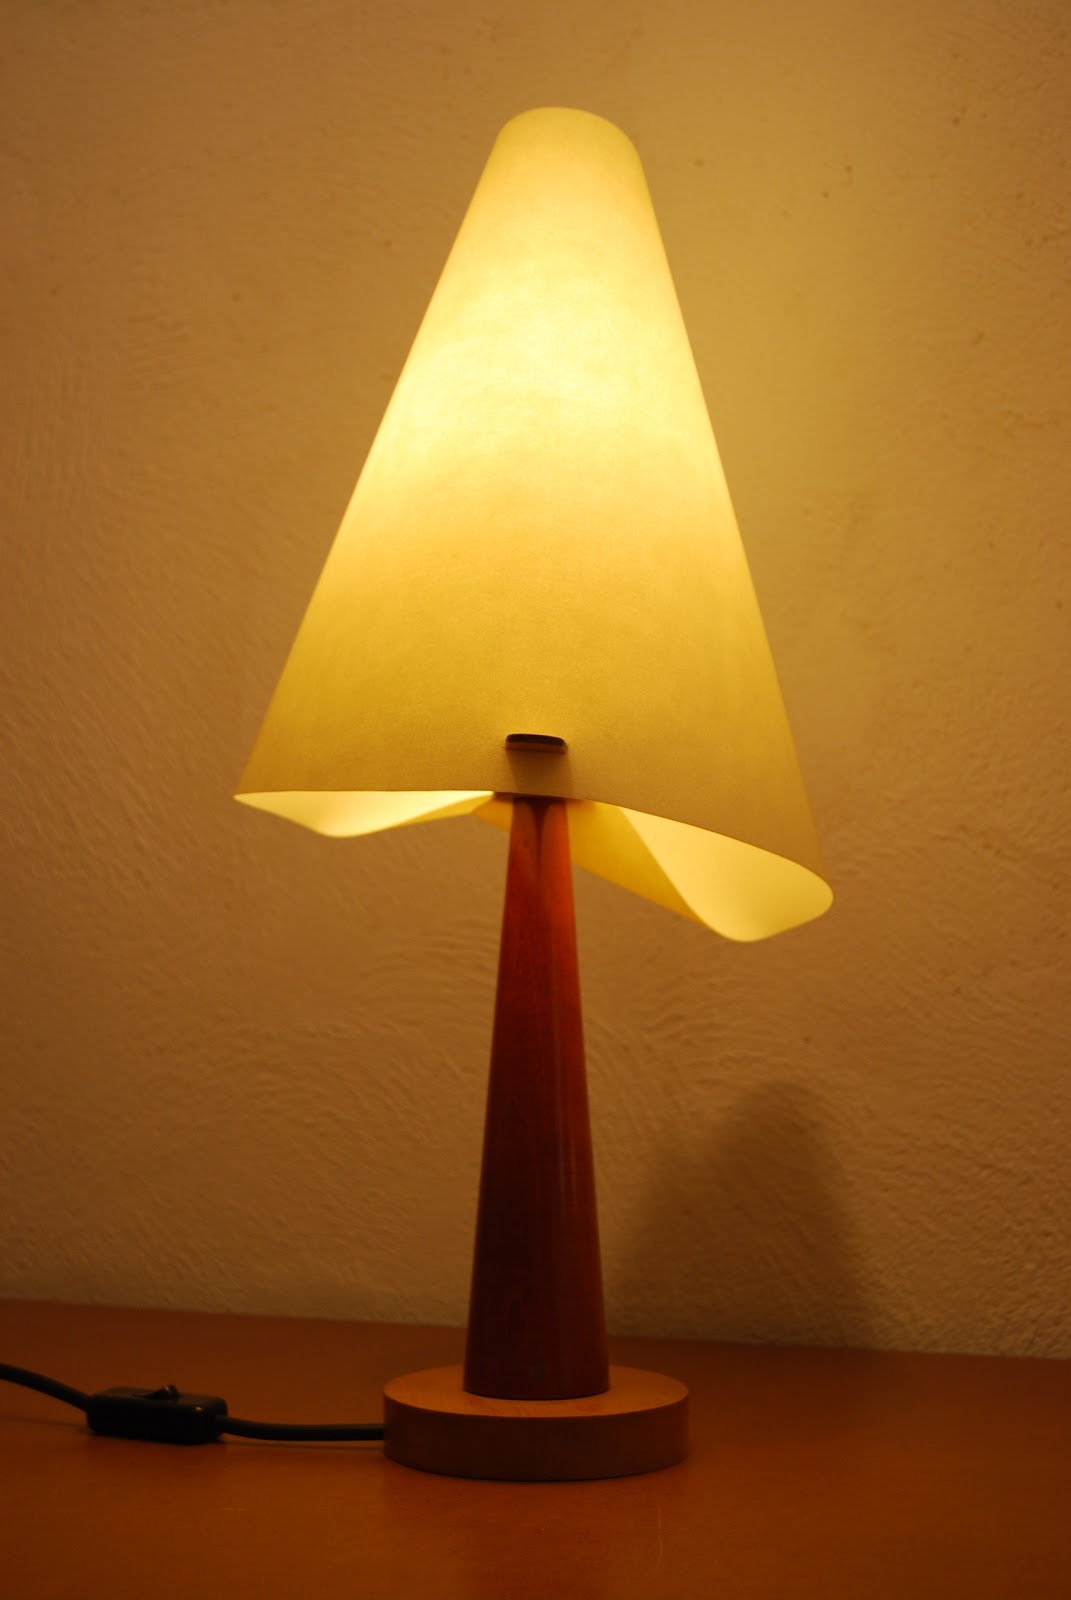 Dise o muebles l mparas y objetos l mpara corneto for Modelos de lamparas